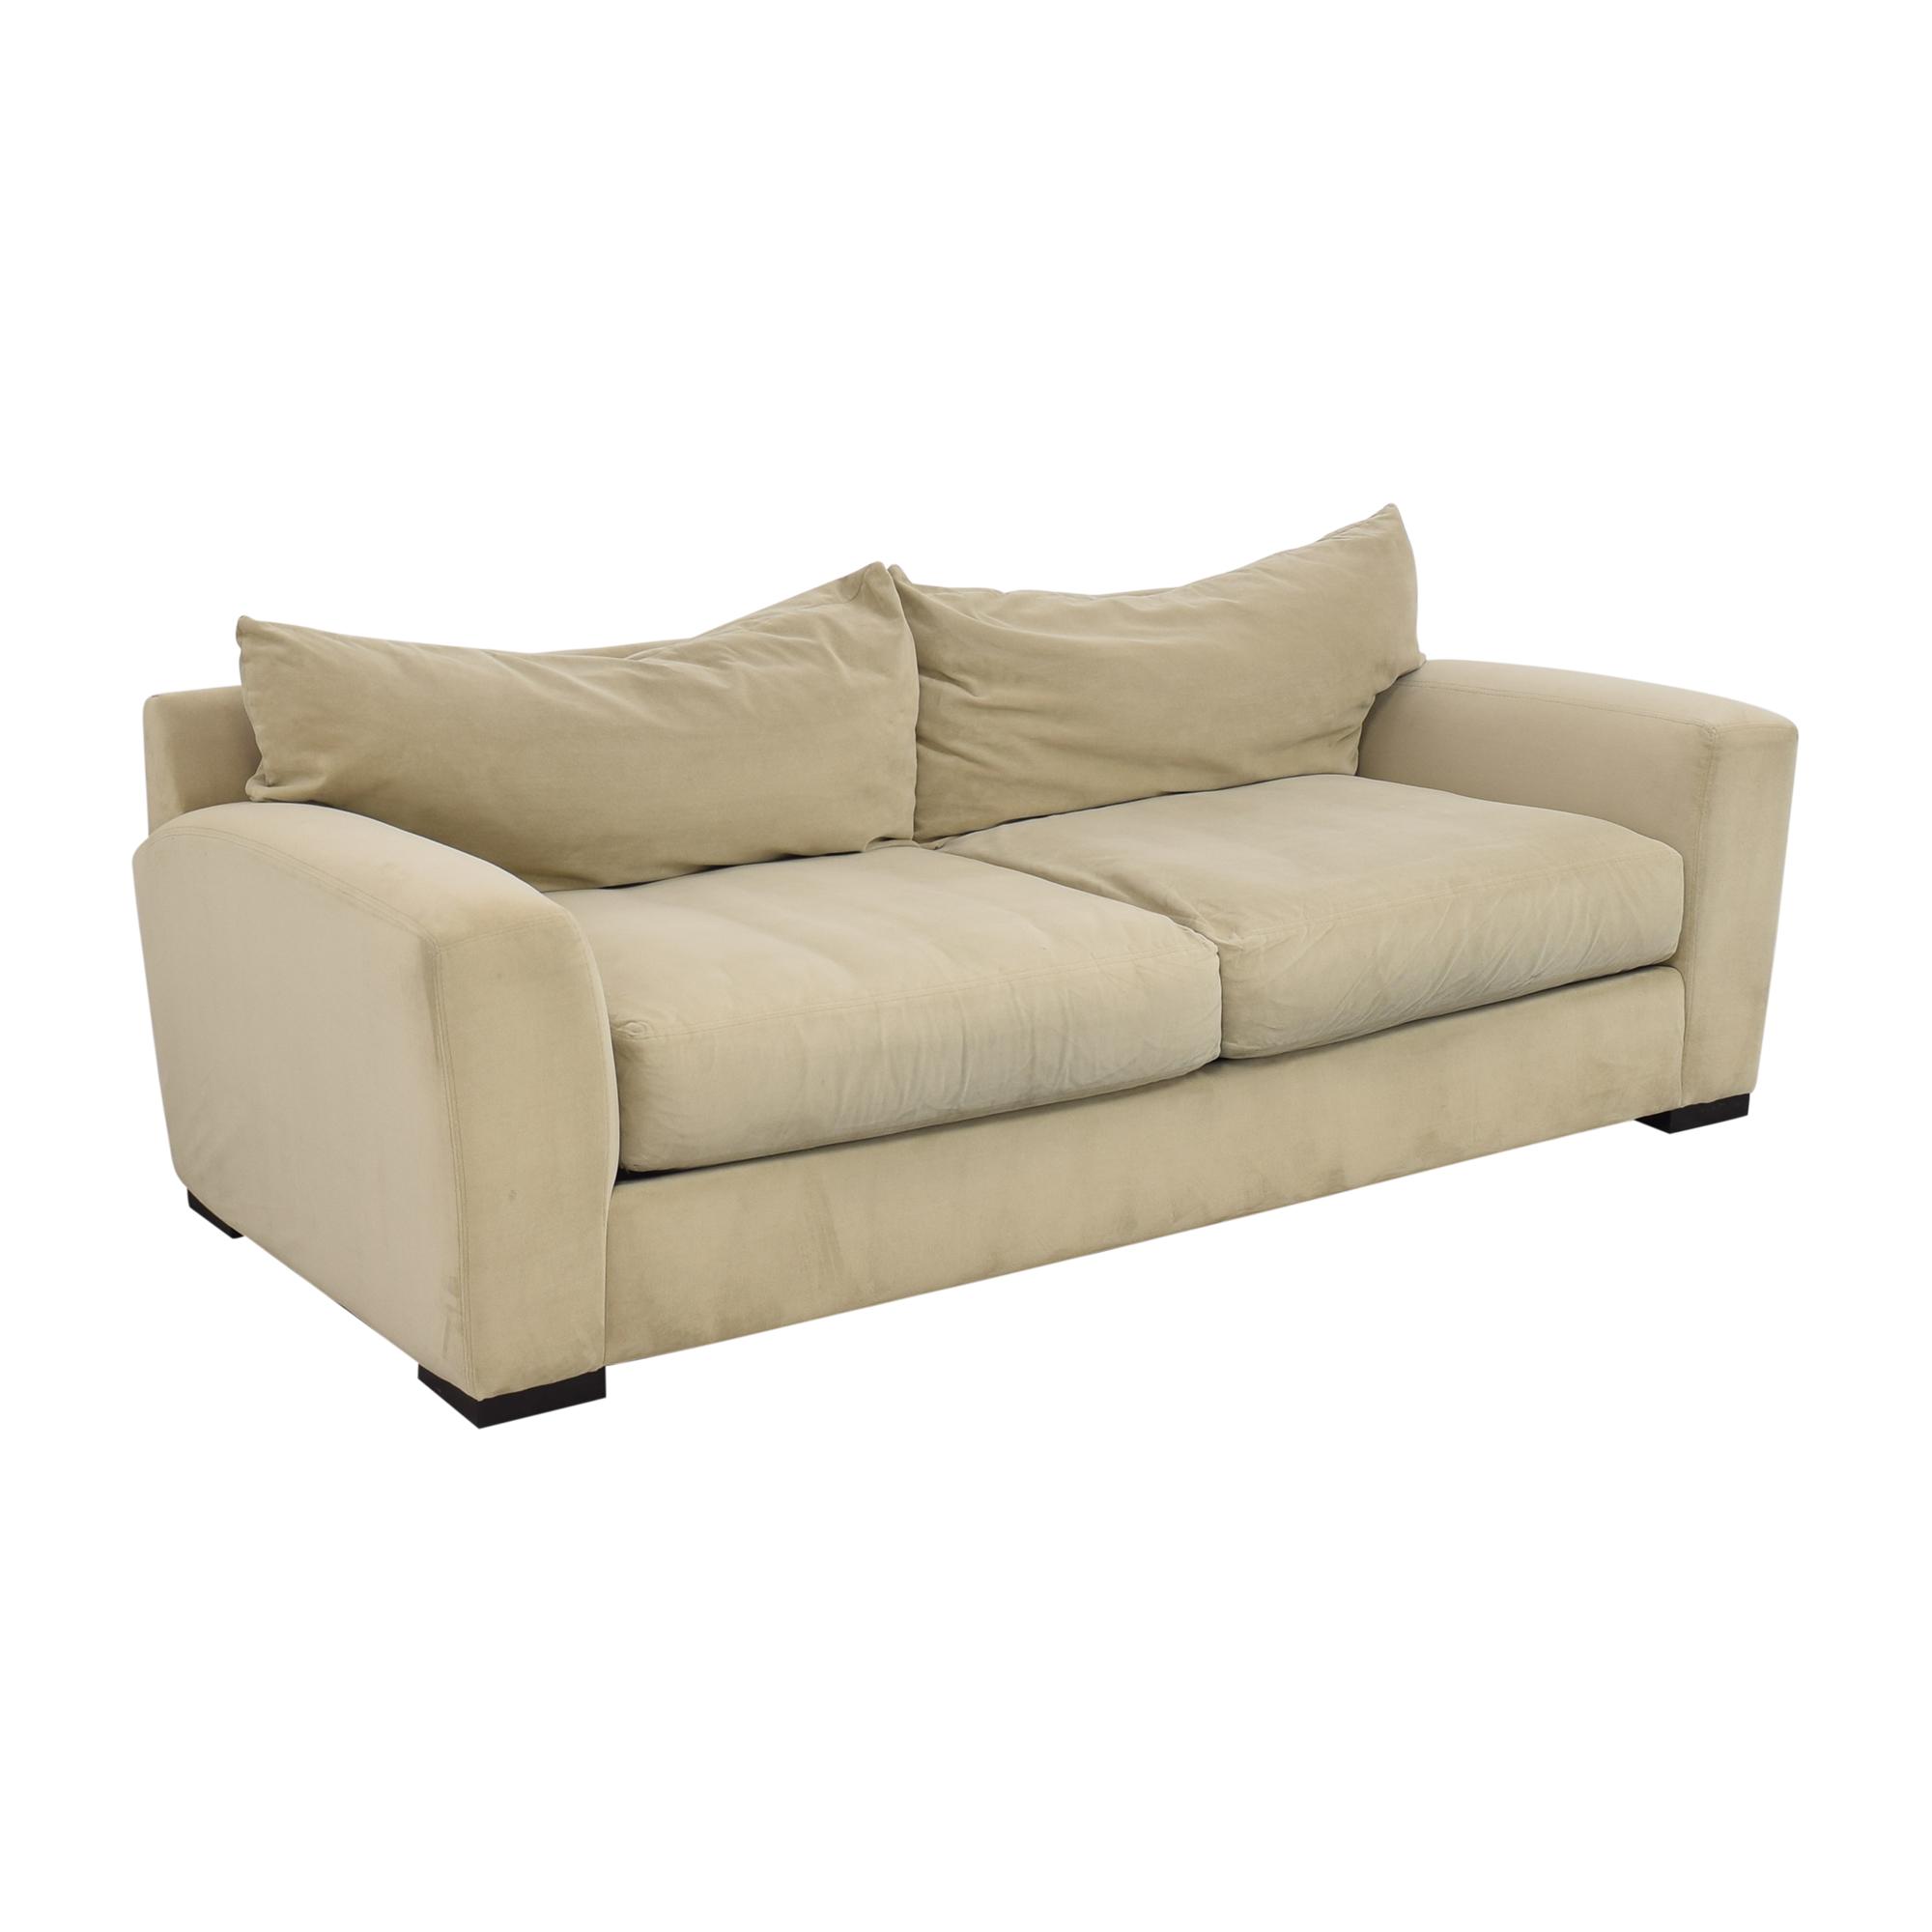 Raymour & Flanigan Raymour & Flanigan Two Cushion Sofa for sale